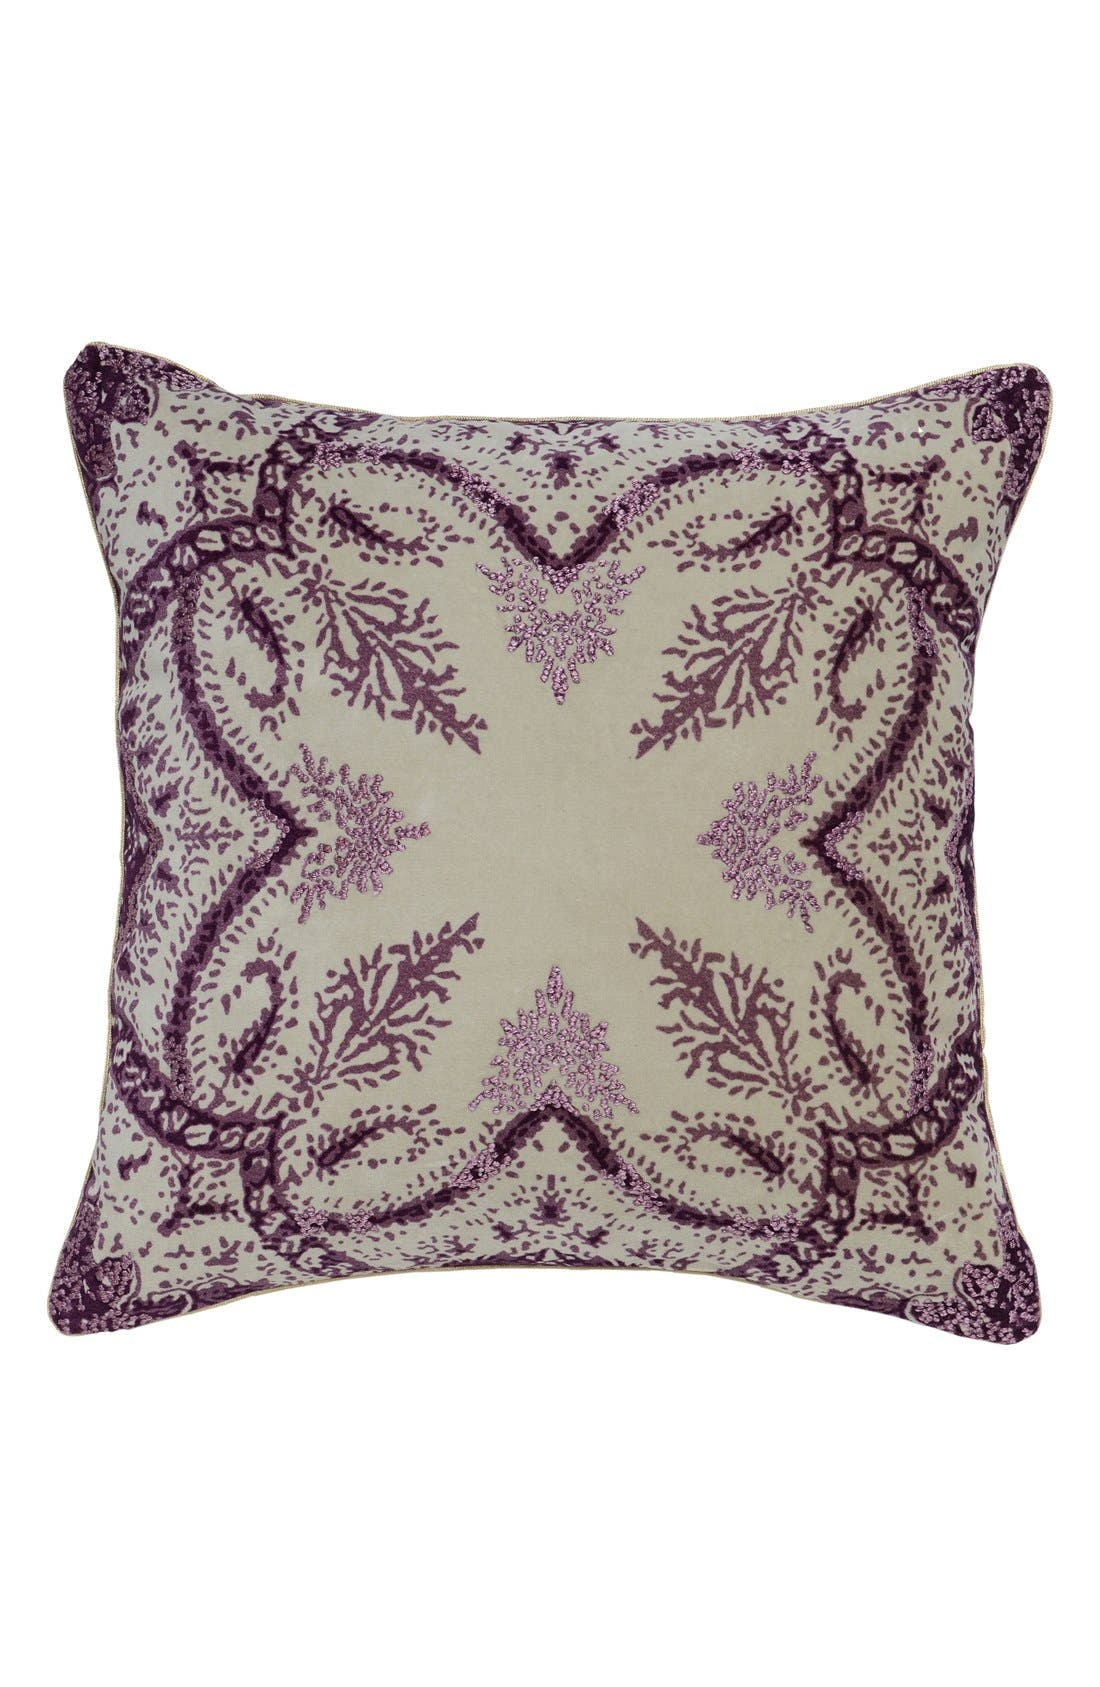 'Precious' Decorative Pillow,                             Main thumbnail 1, color,                             Plum